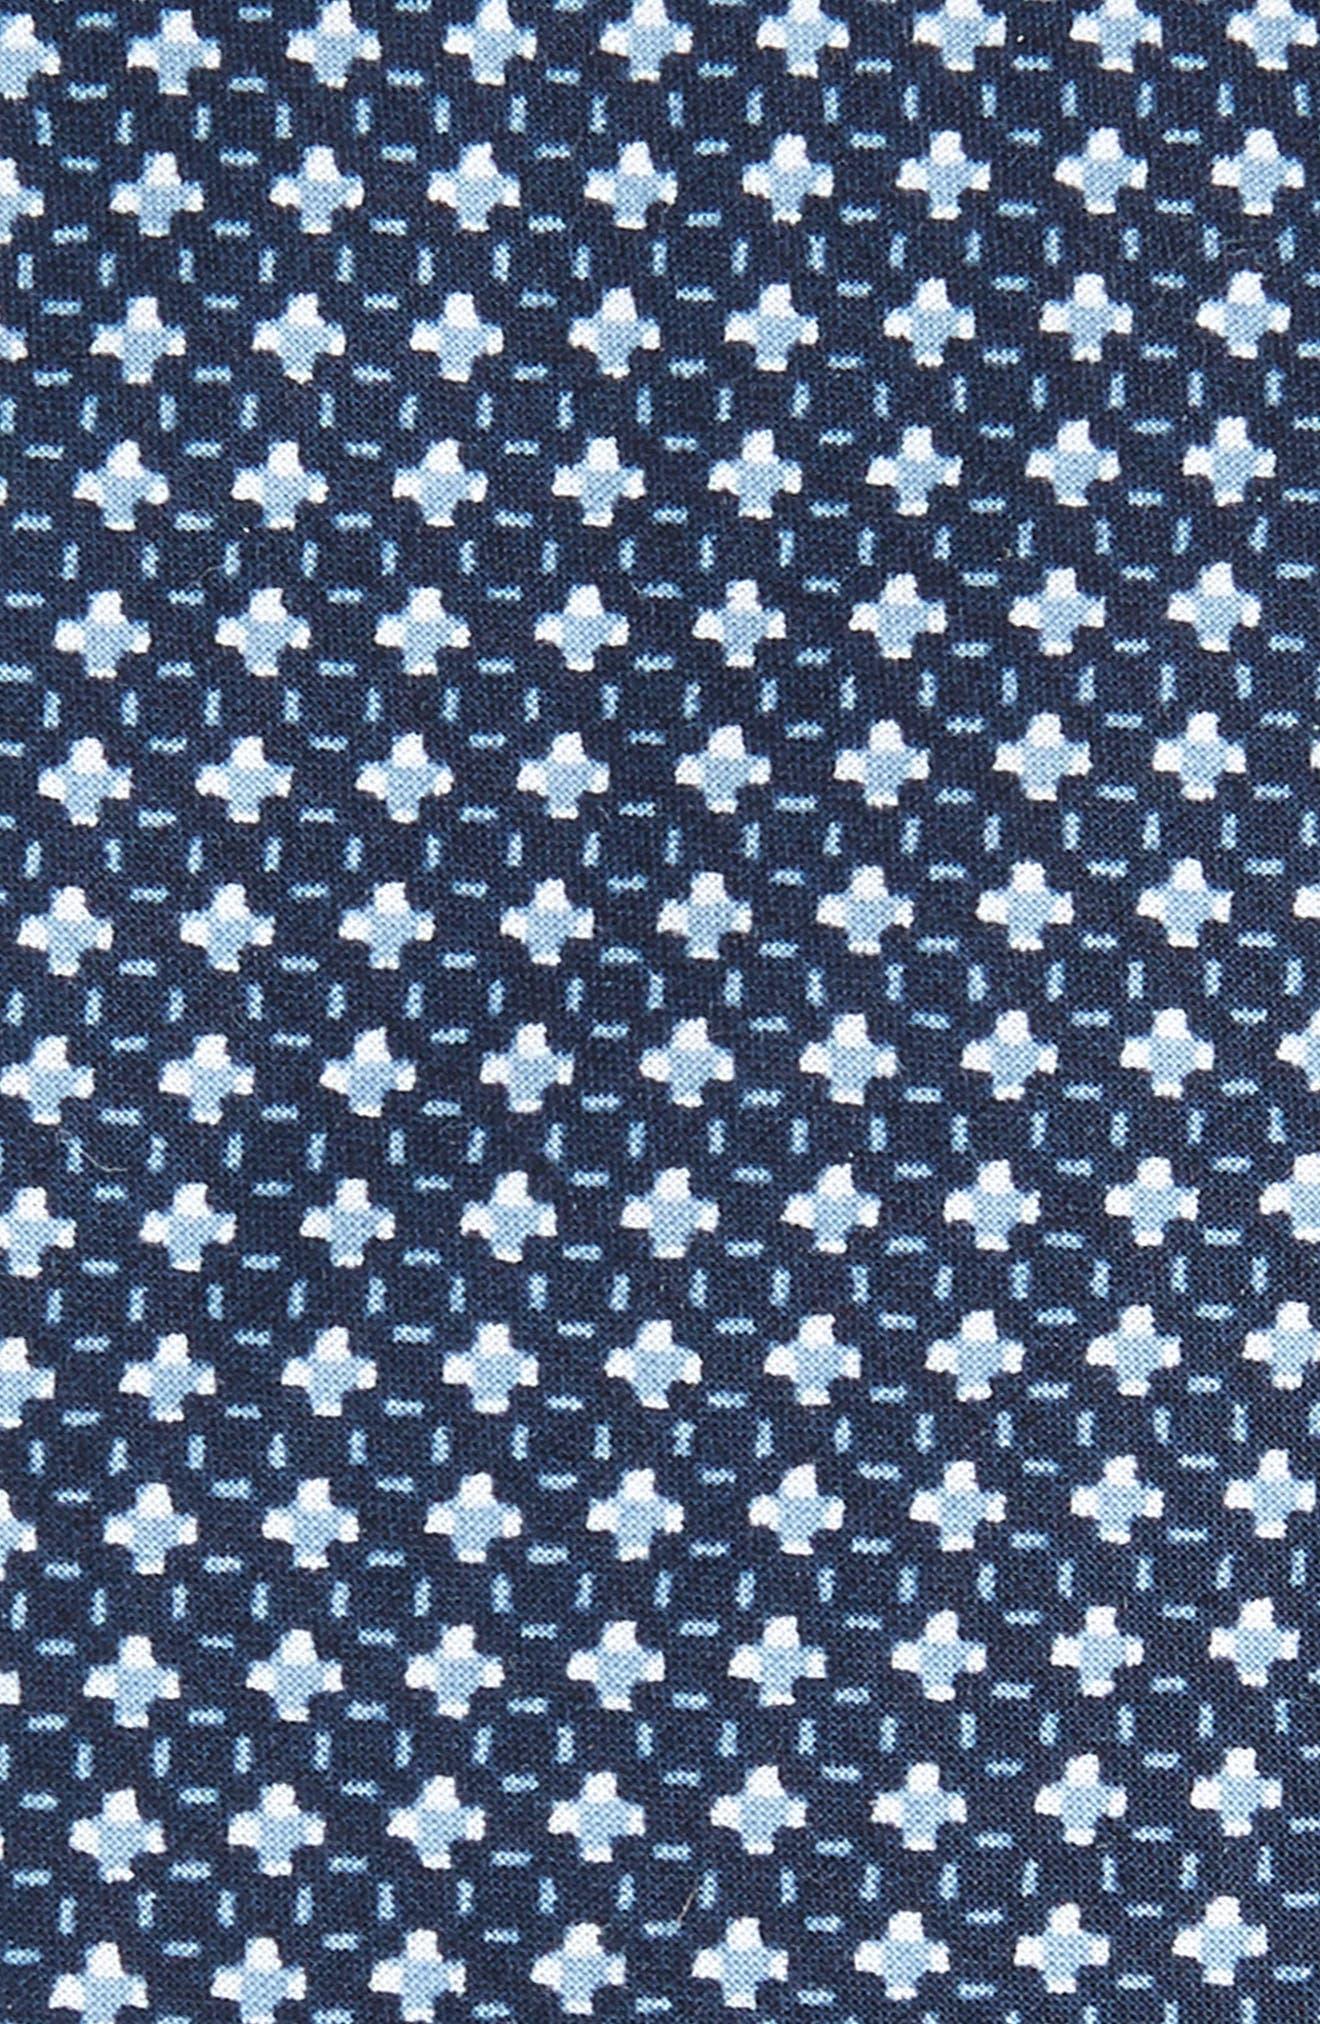 Olympos Geometric Cotton Tie,                             Alternate thumbnail 2, color,                             001